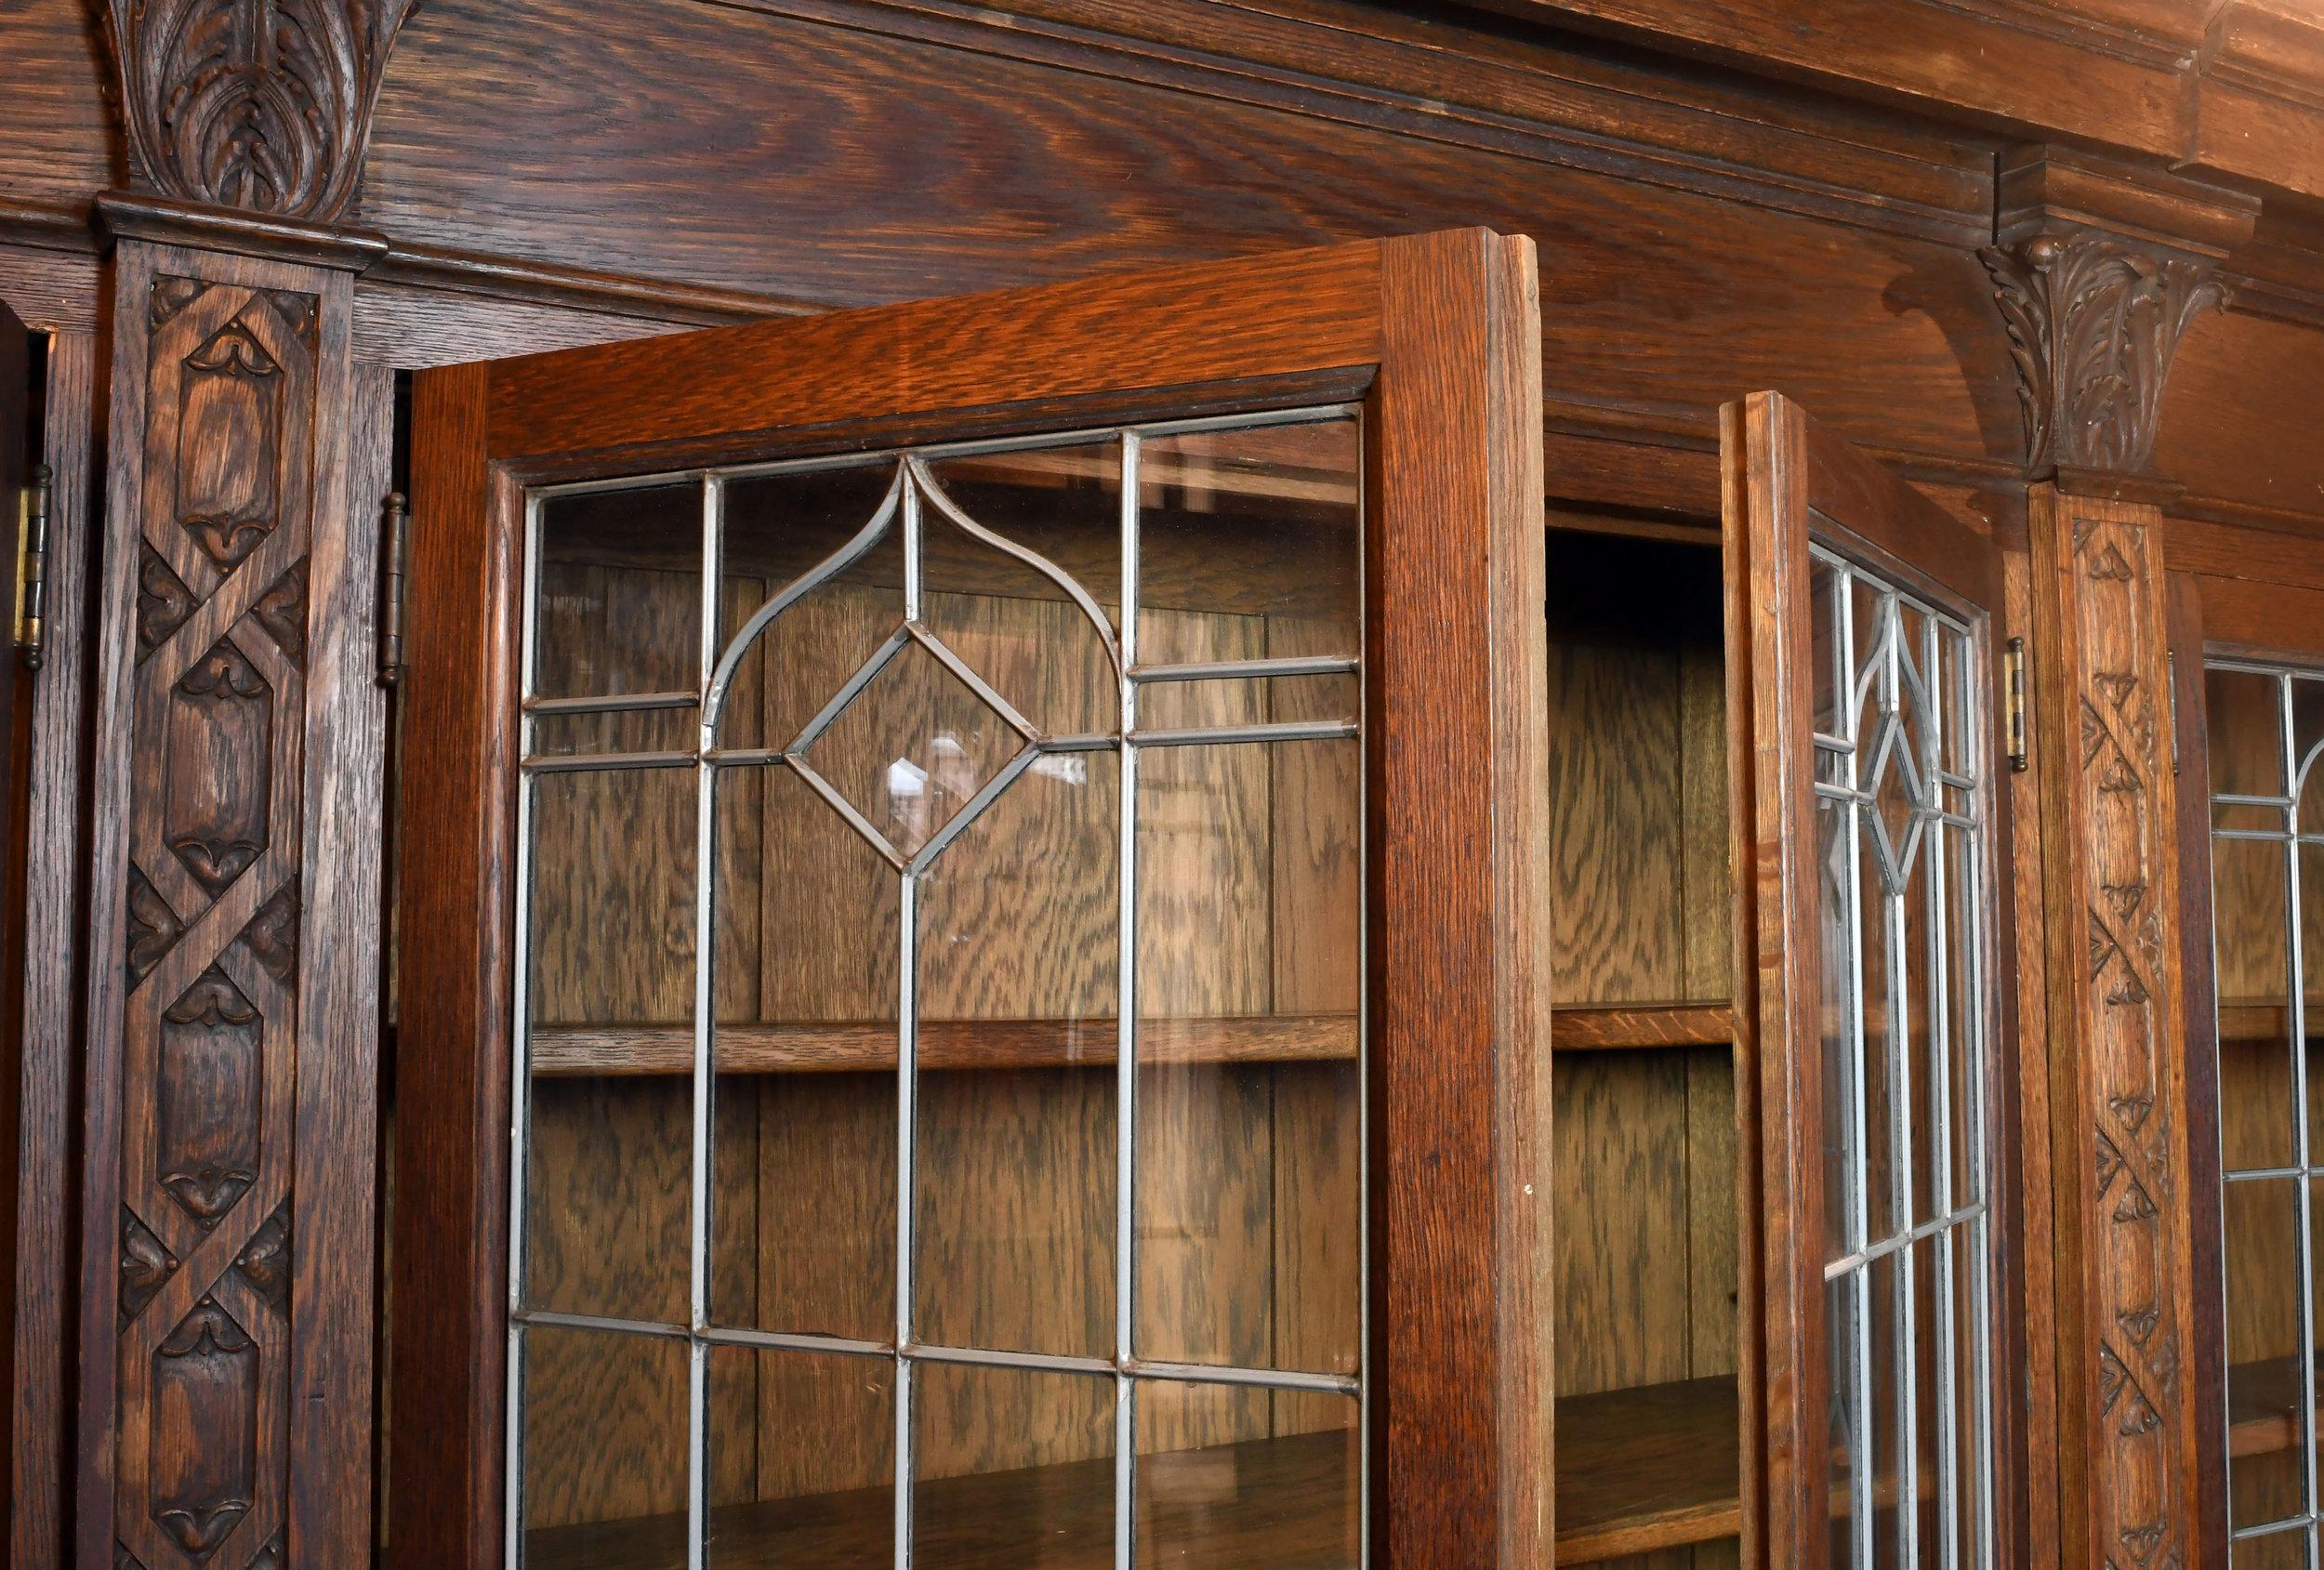 47334-large-bookcase-unit-open-doors.jpg